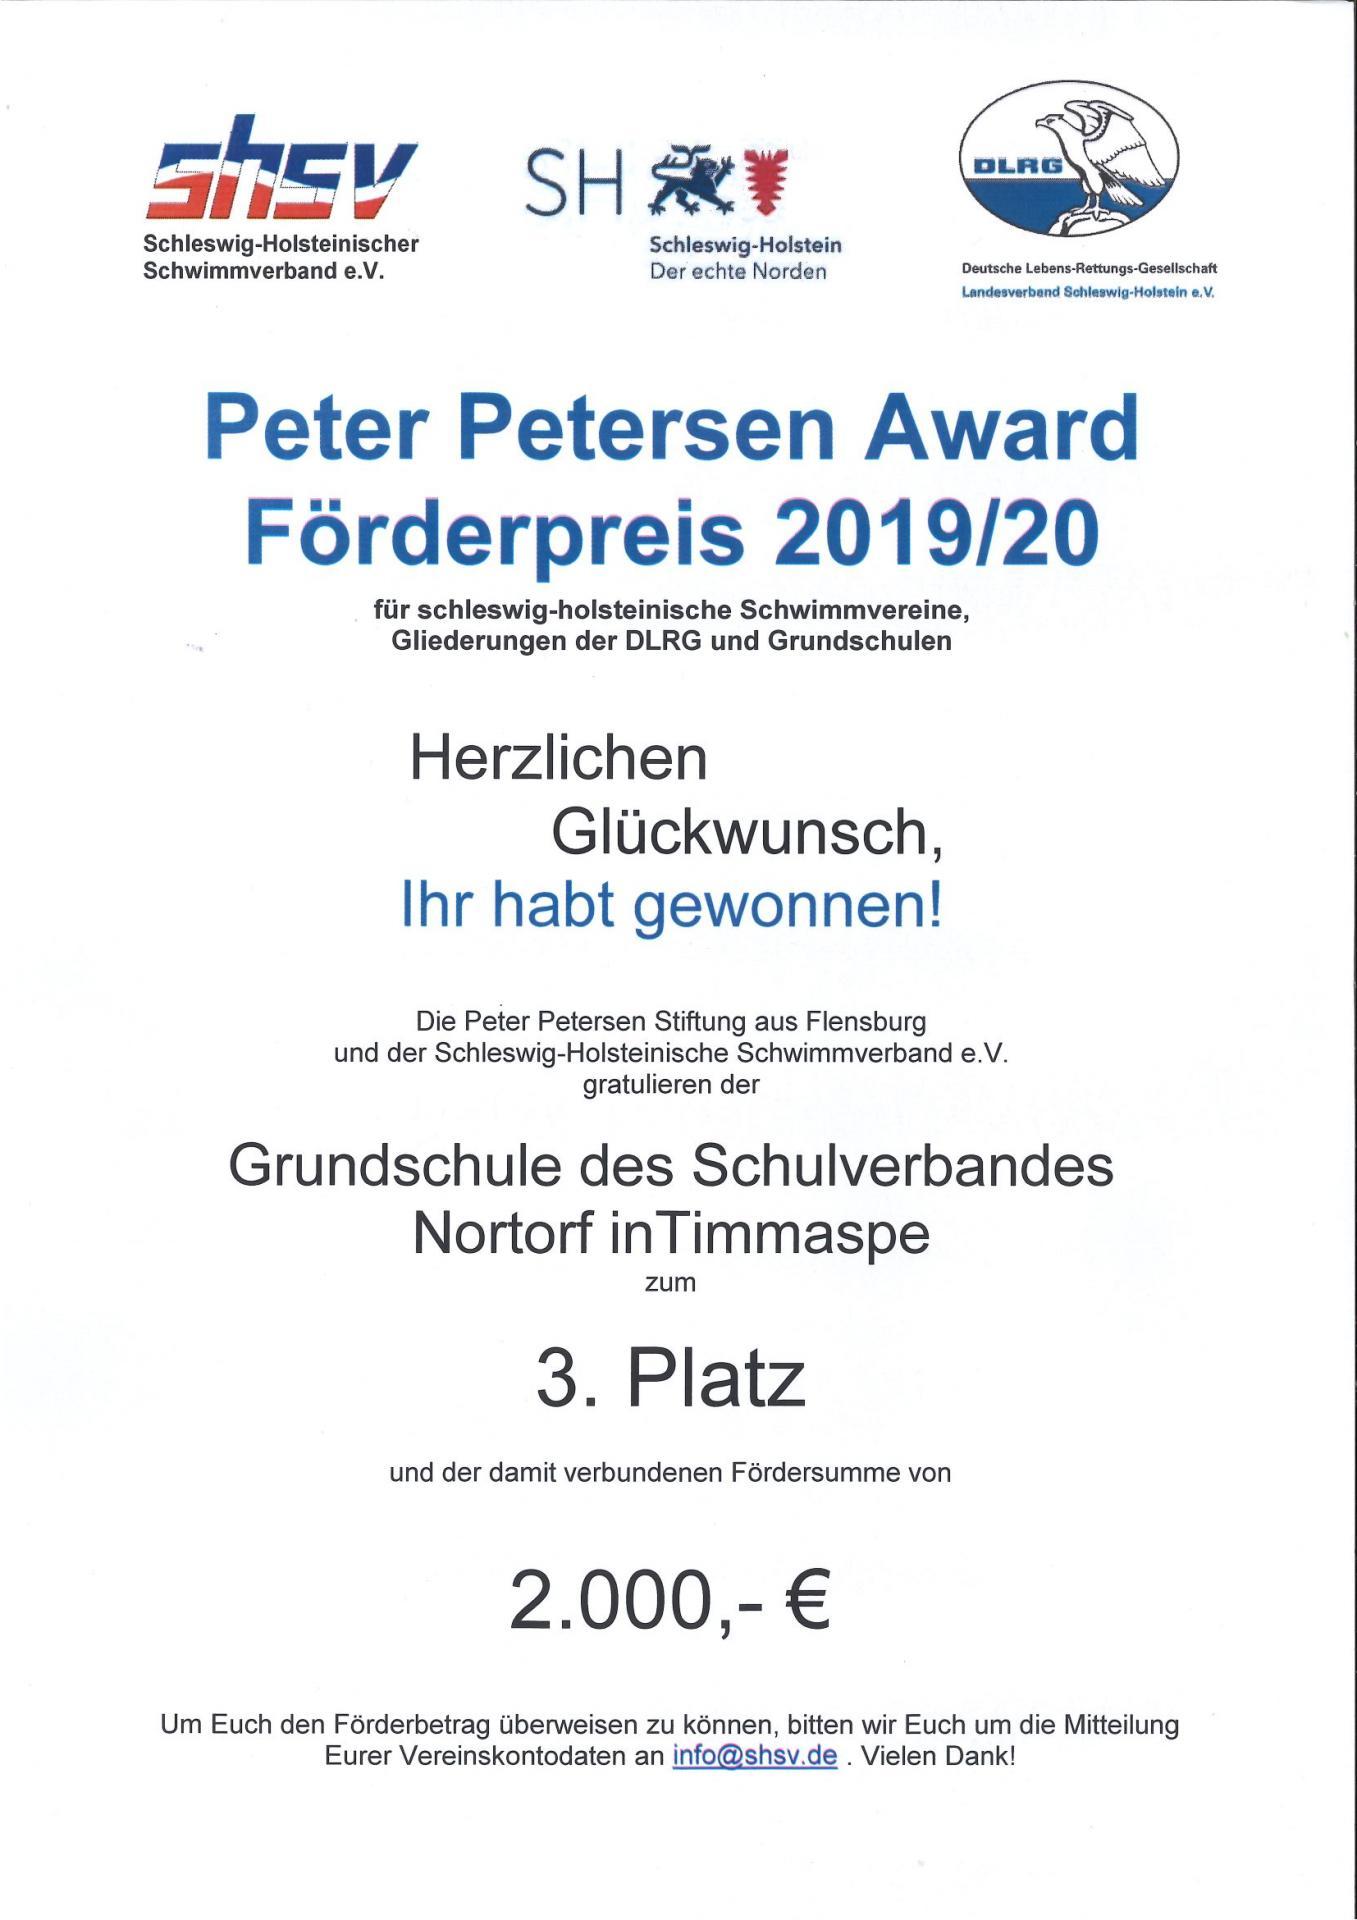 Urkunde Peter Petersen Award